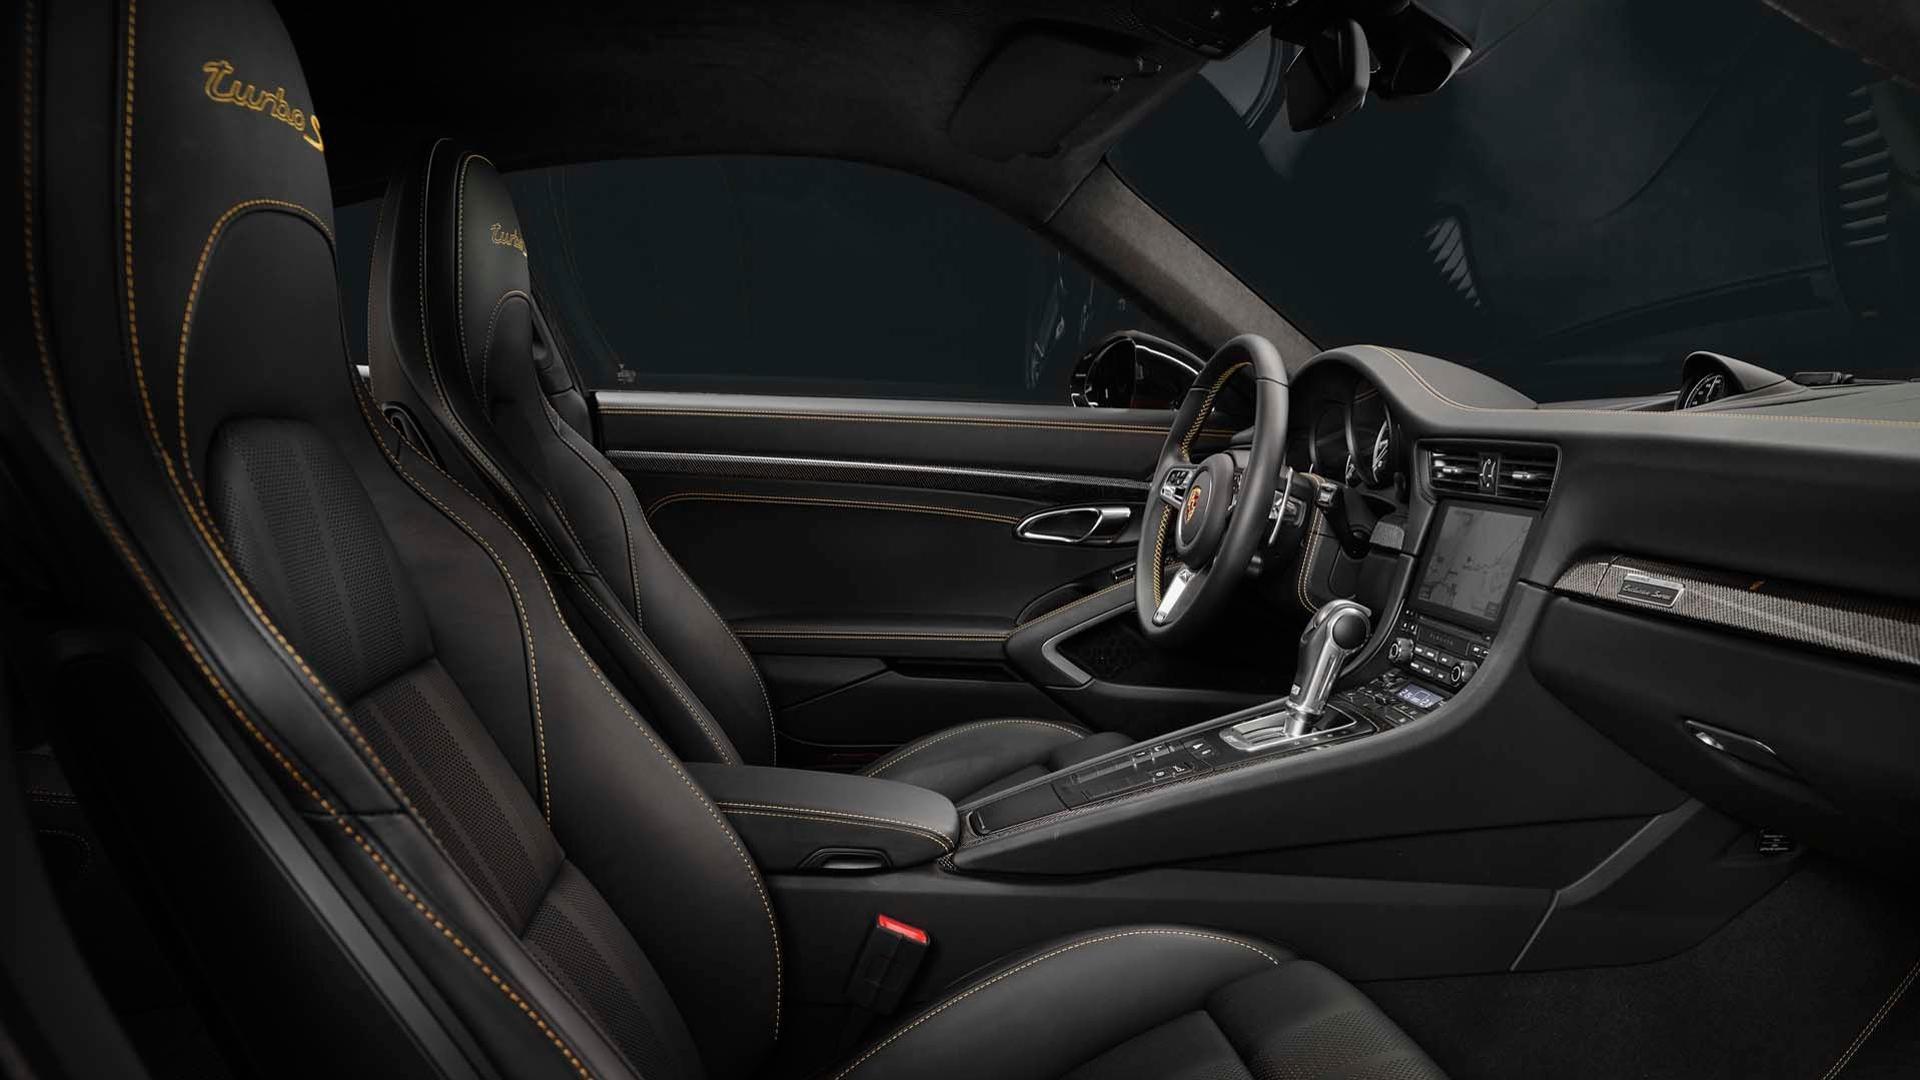 Notranjost - Porsche 911 Turbo S